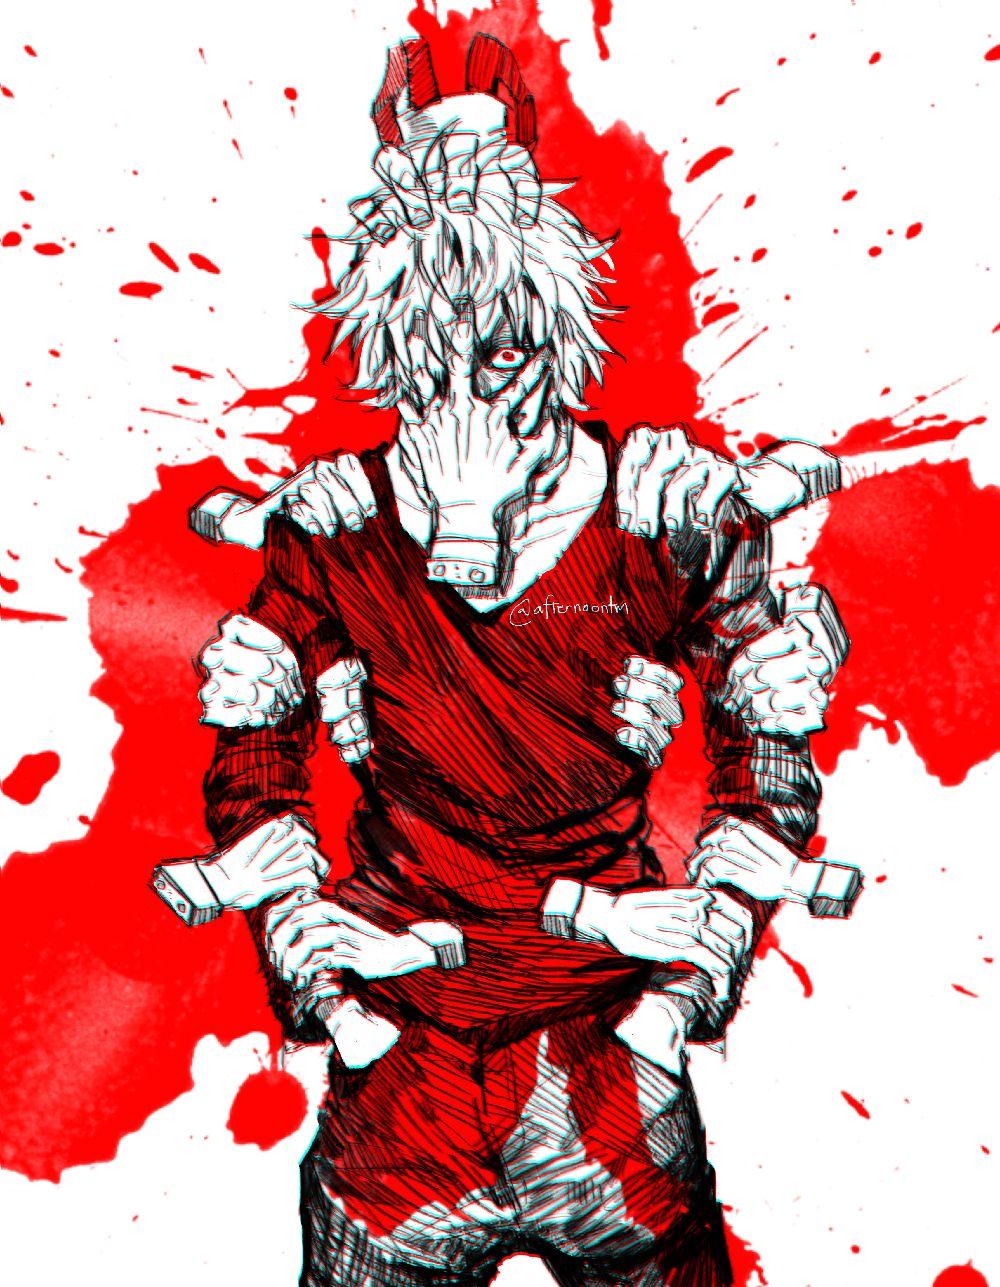 Shigaraki Tomura By Afternoontm On Deviantart In 2020 Hero Boku No Hero Academia My Hero